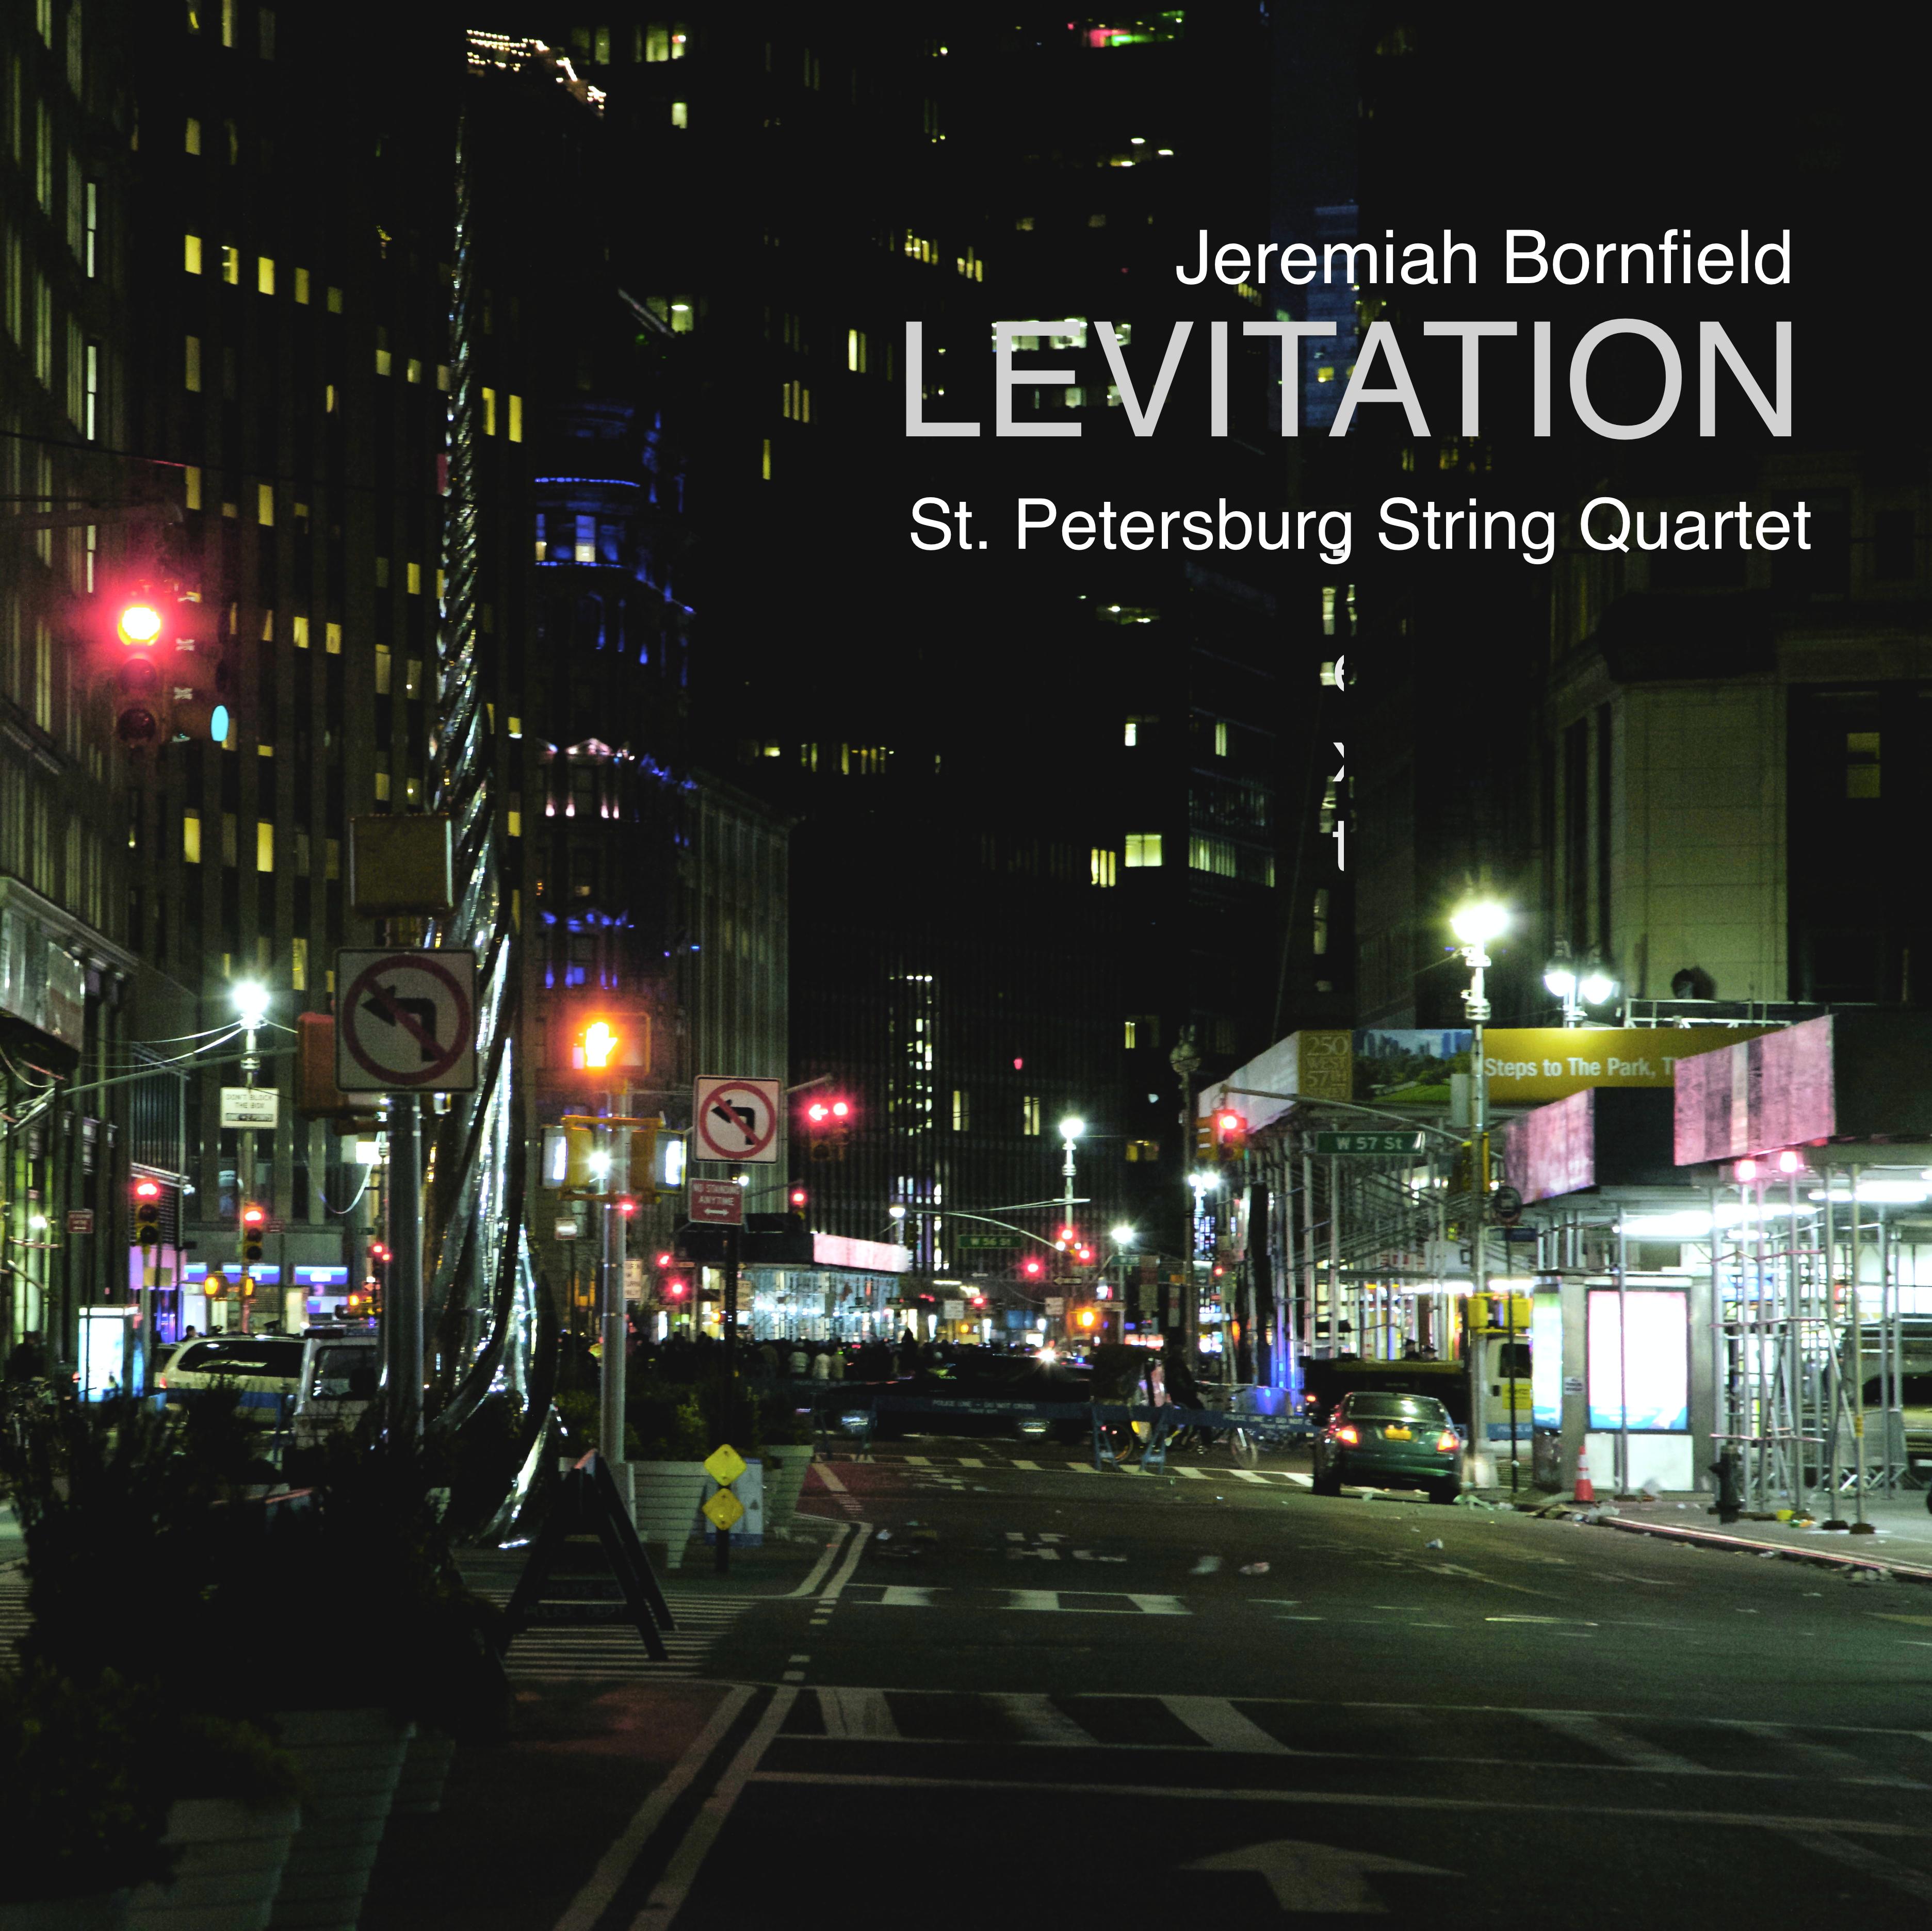 Levitation St. Petersburg String Quartet Jeremiah Bornfield